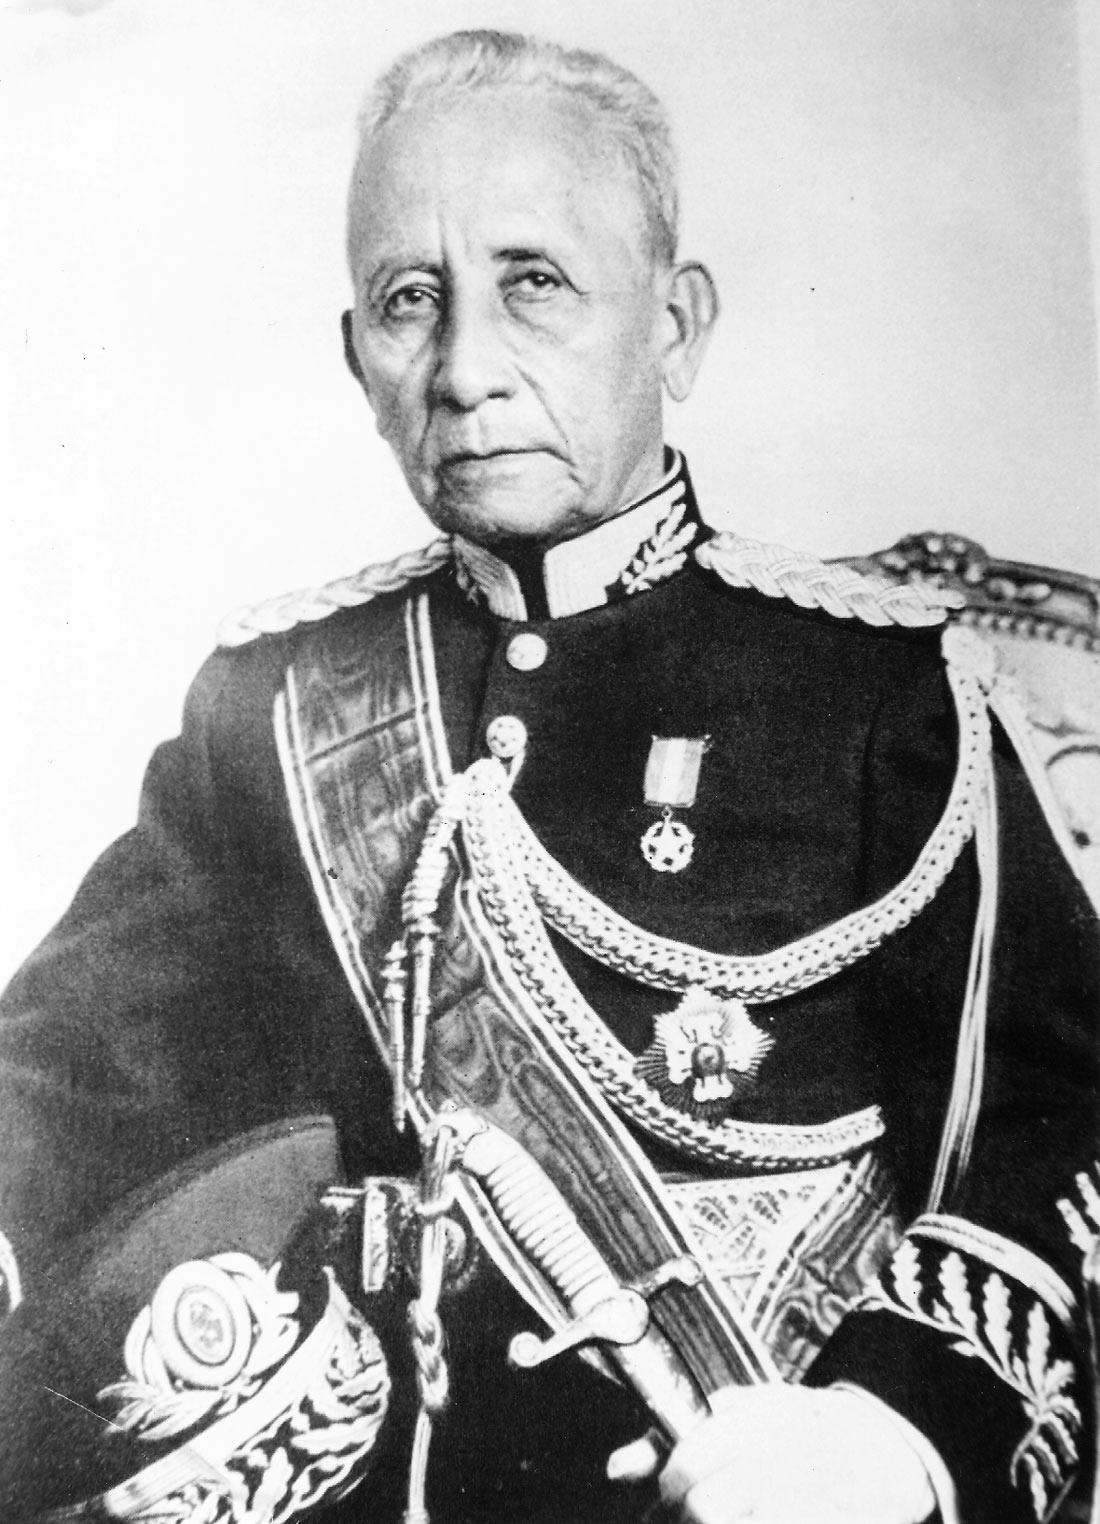 Inspirador do Projeto Rondon nascia há 155 anos